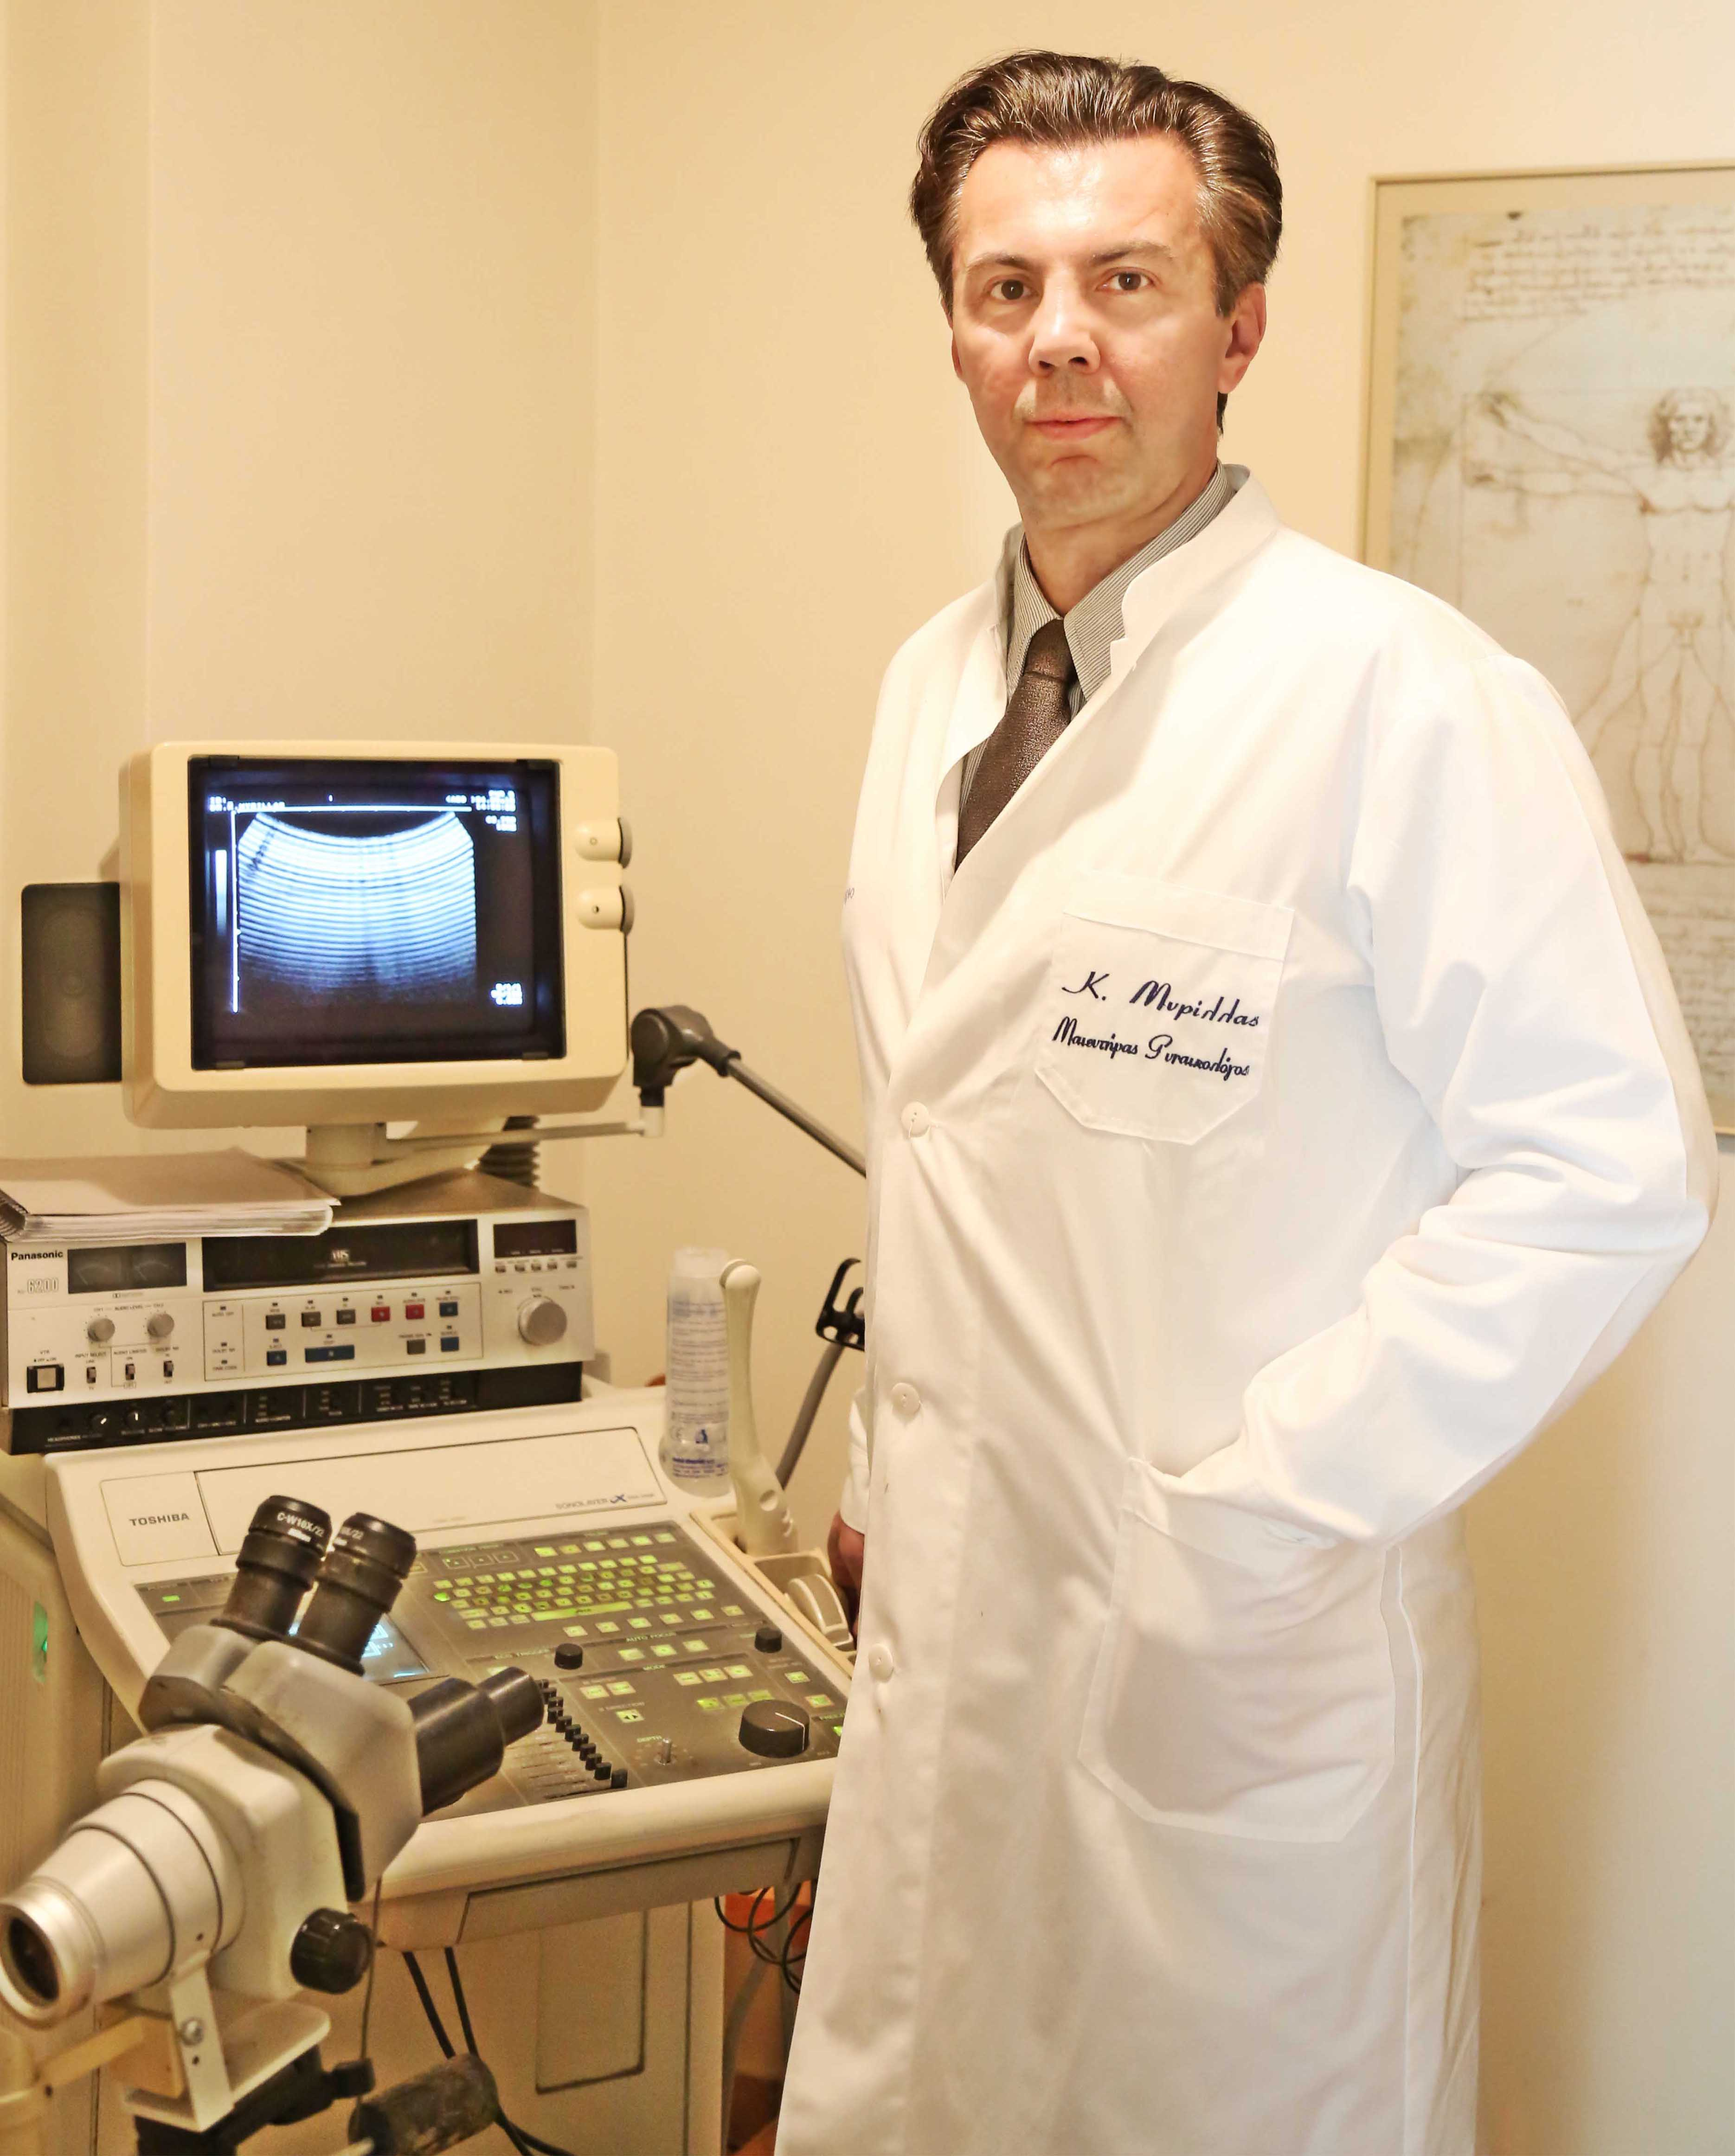 Dr. Κωνσταντίνος Μυρίλλας